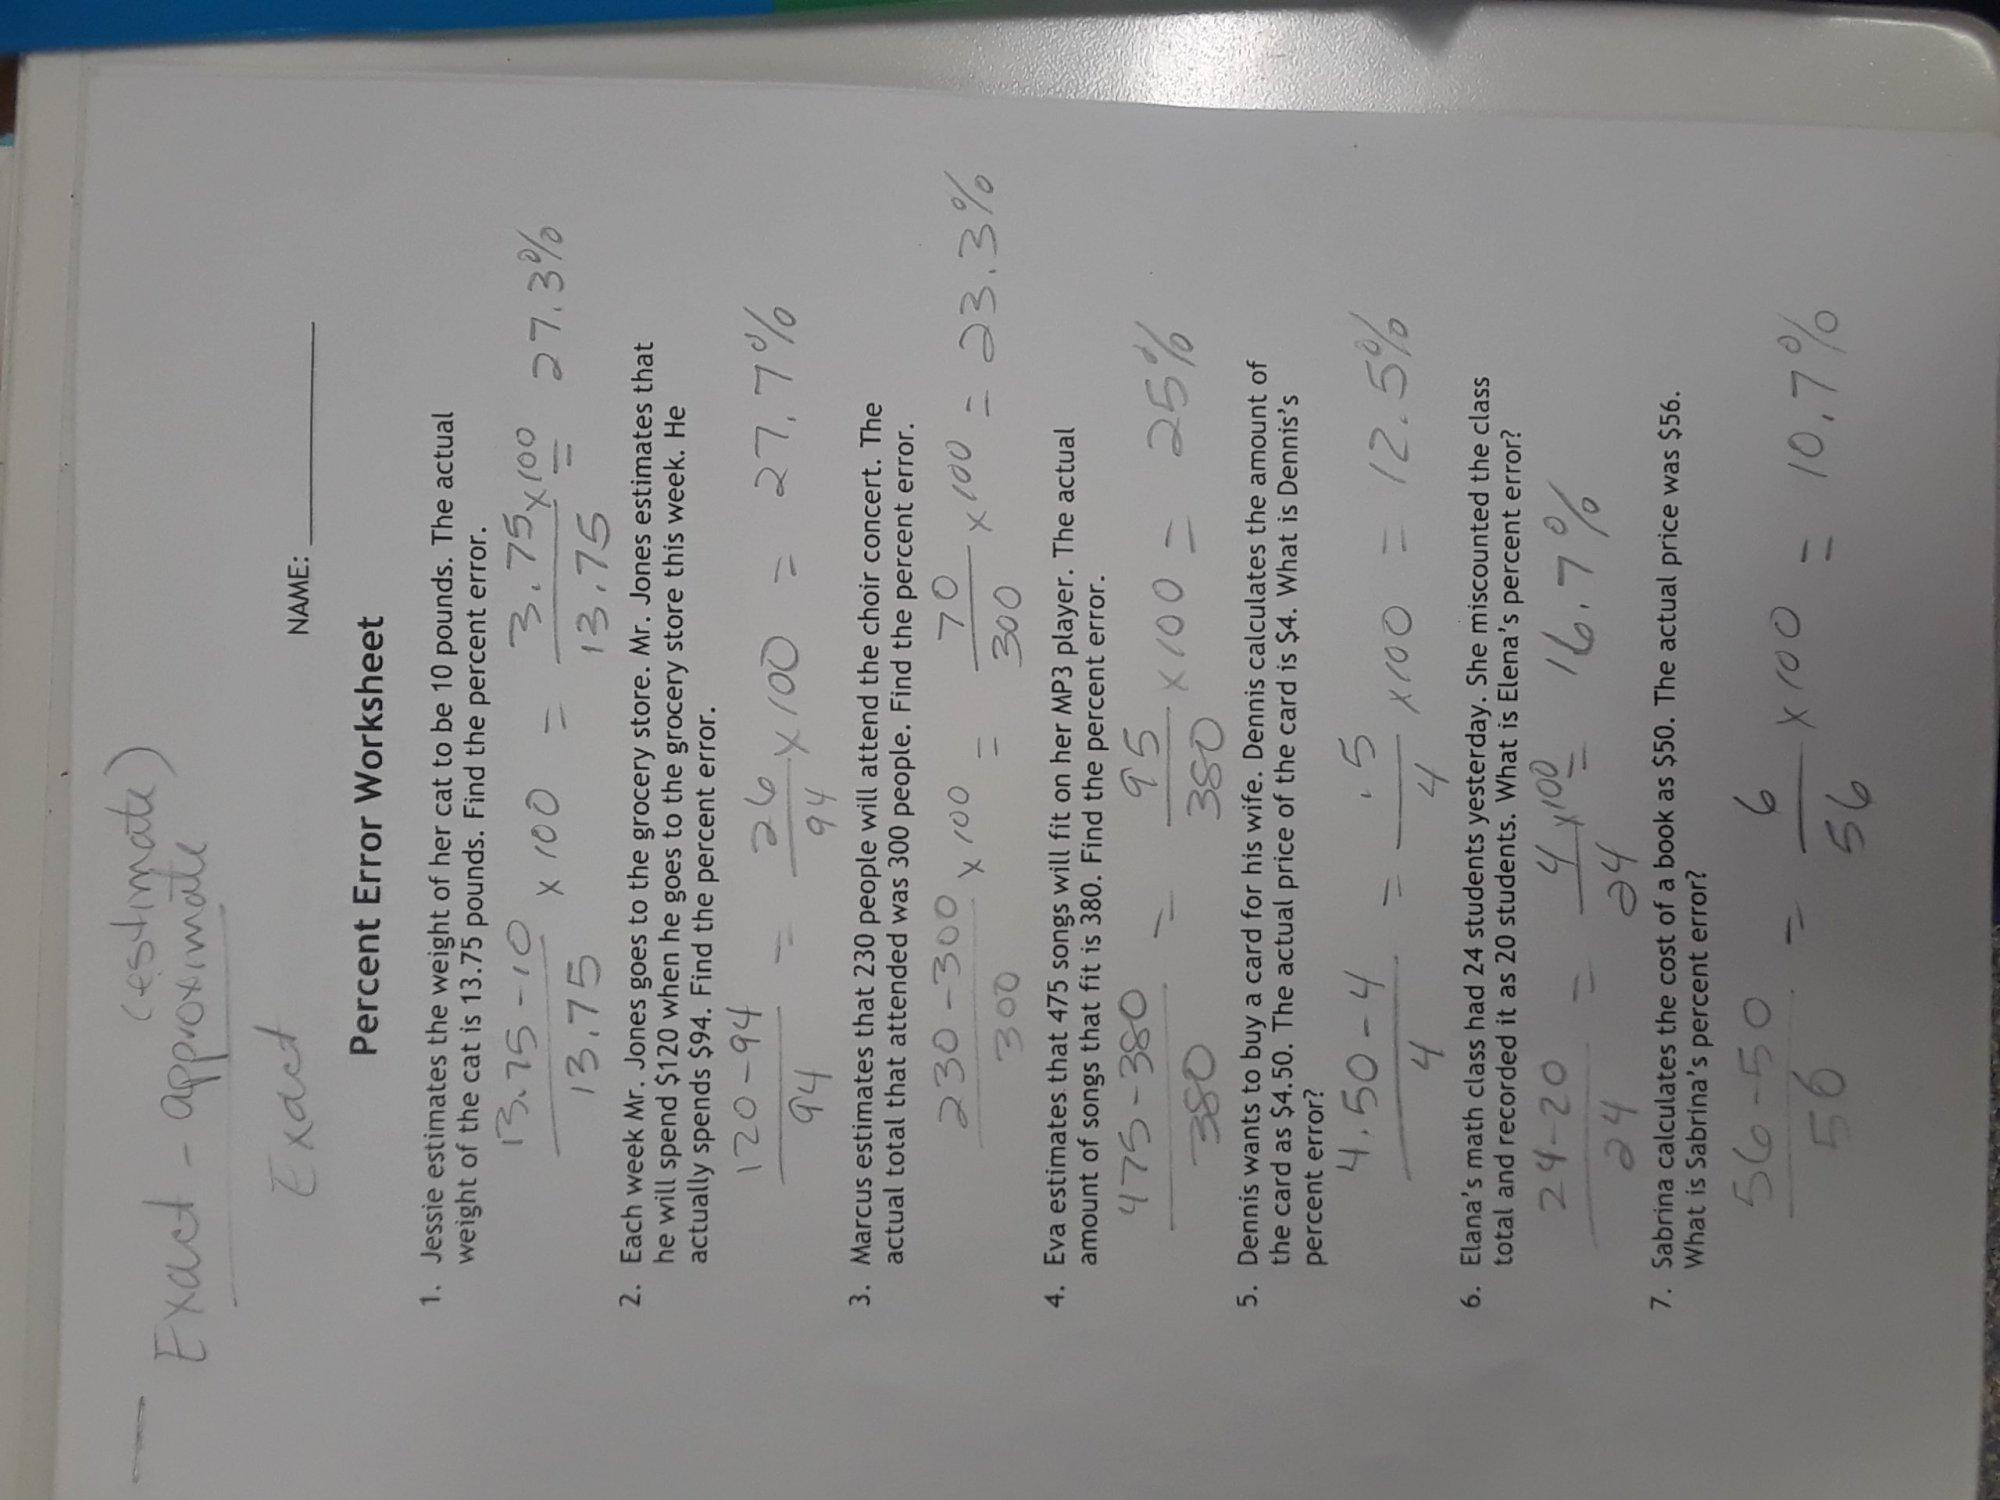 hight resolution of 12 Percent Error Worksheet Answer Key   Worksheets Ideas Printable